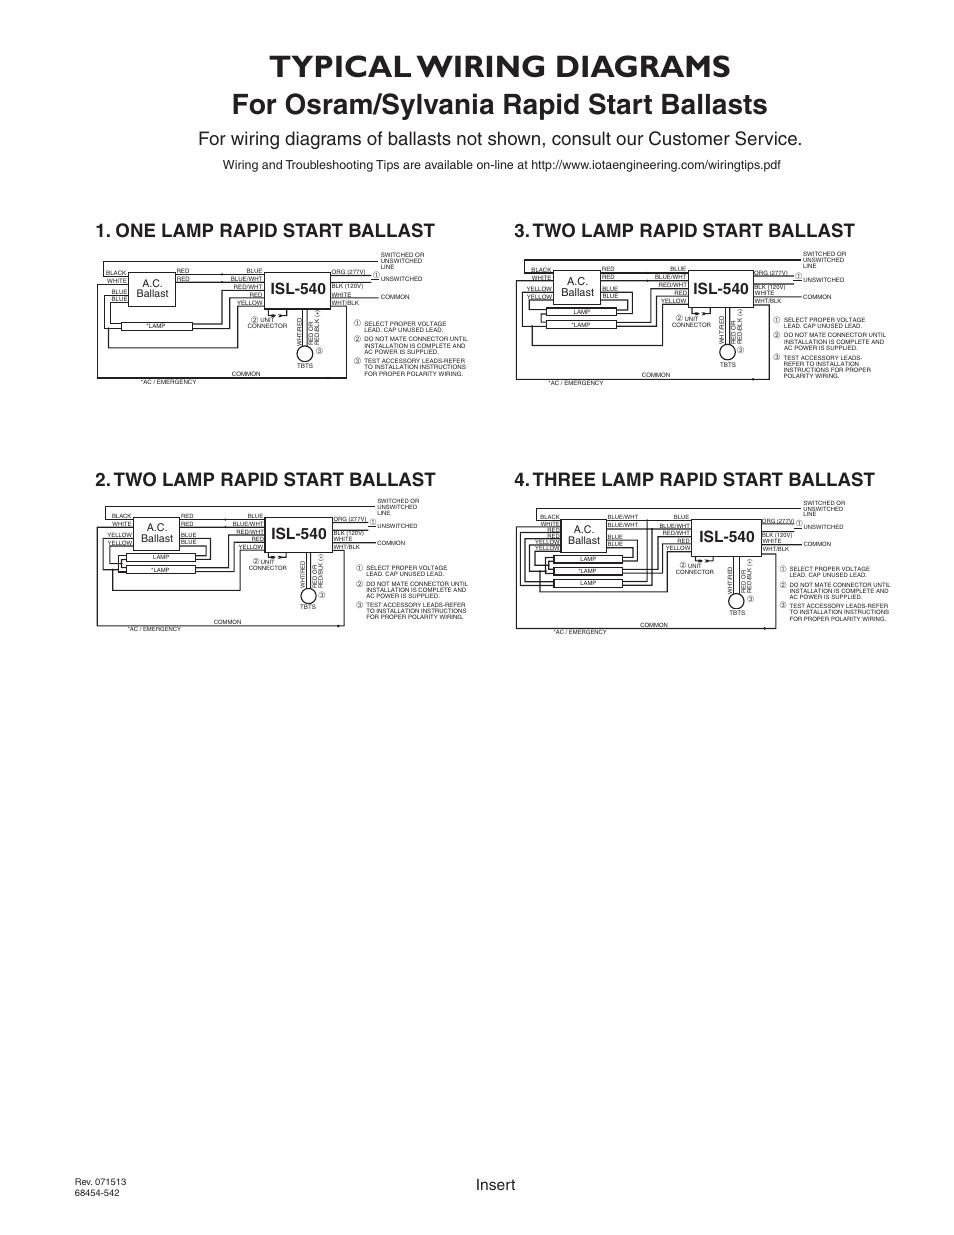 hight resolution of typical wiring diagrams for osram sylvania rapid start ballasts isl 540 ballast wiring diagram